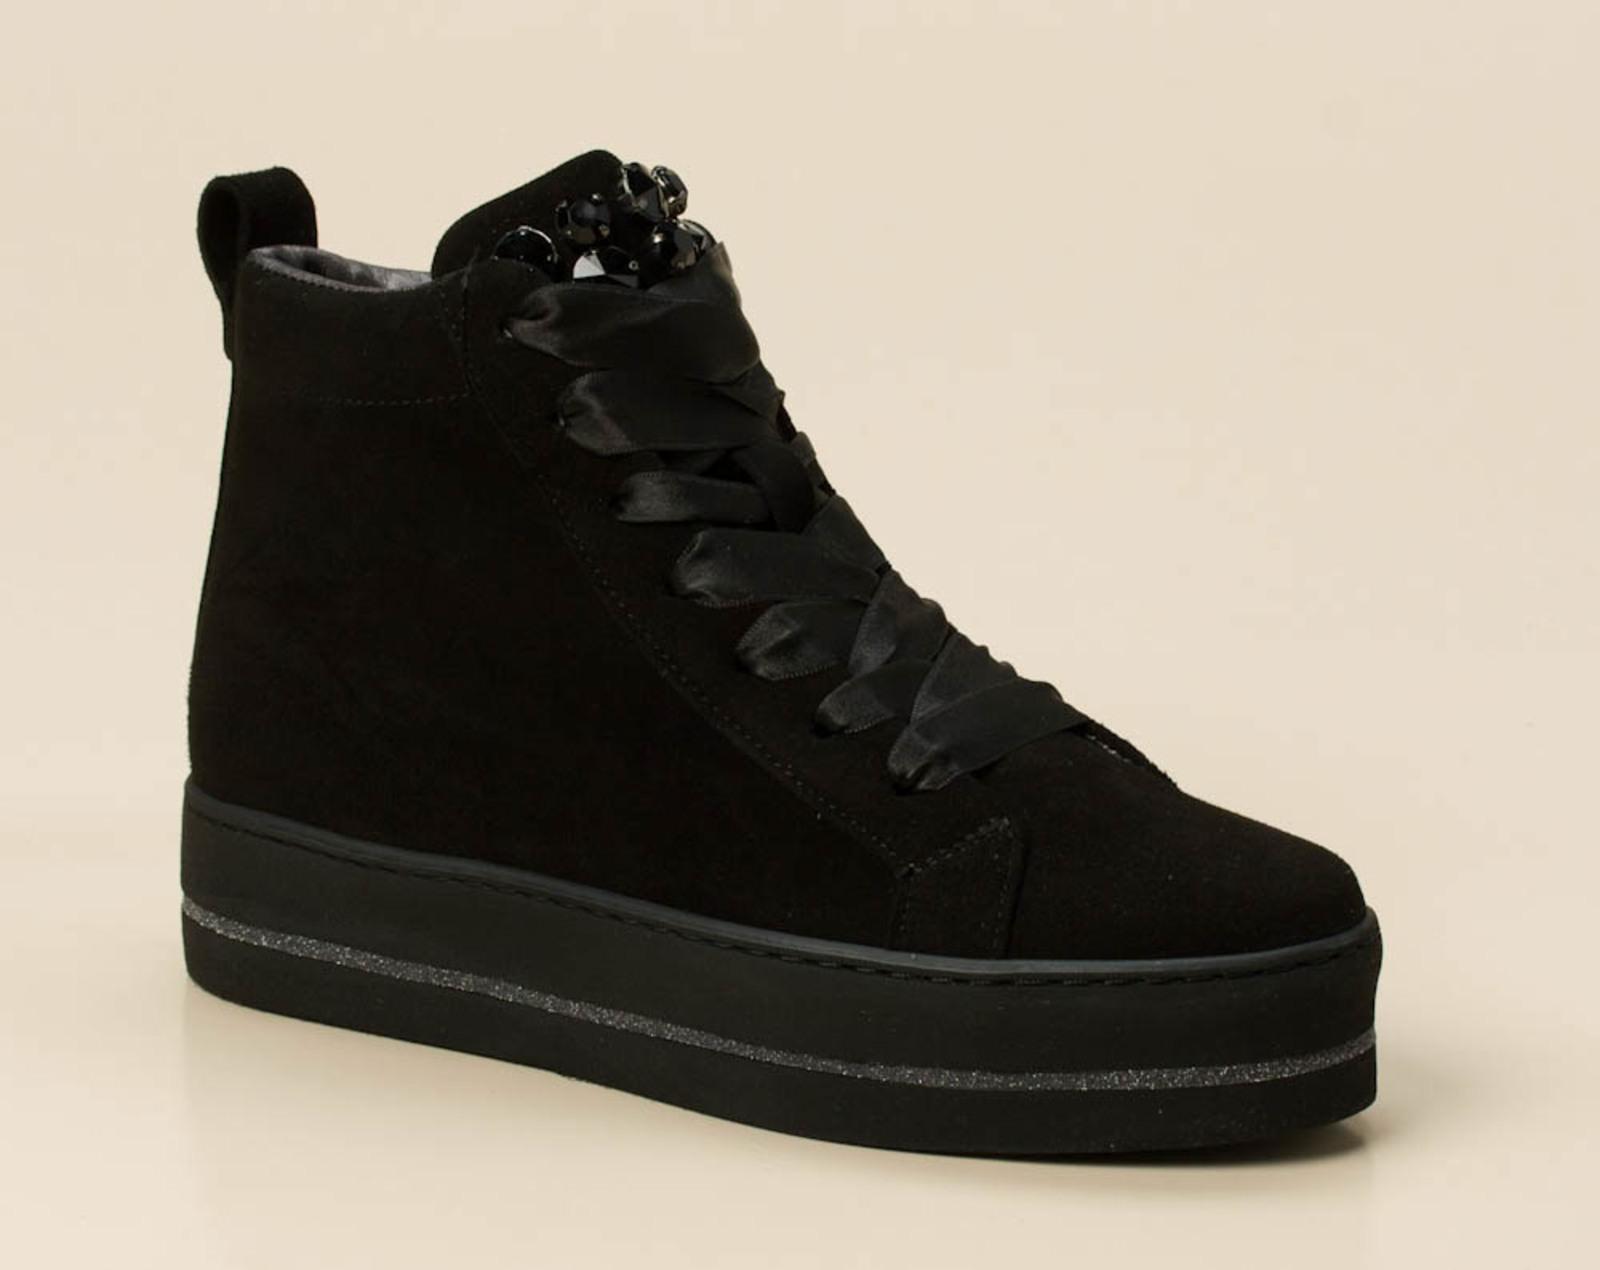 Maripé Damen Sneaker high in schwarz kaufen   Zumnorde Online-Shop 42342dfeb1